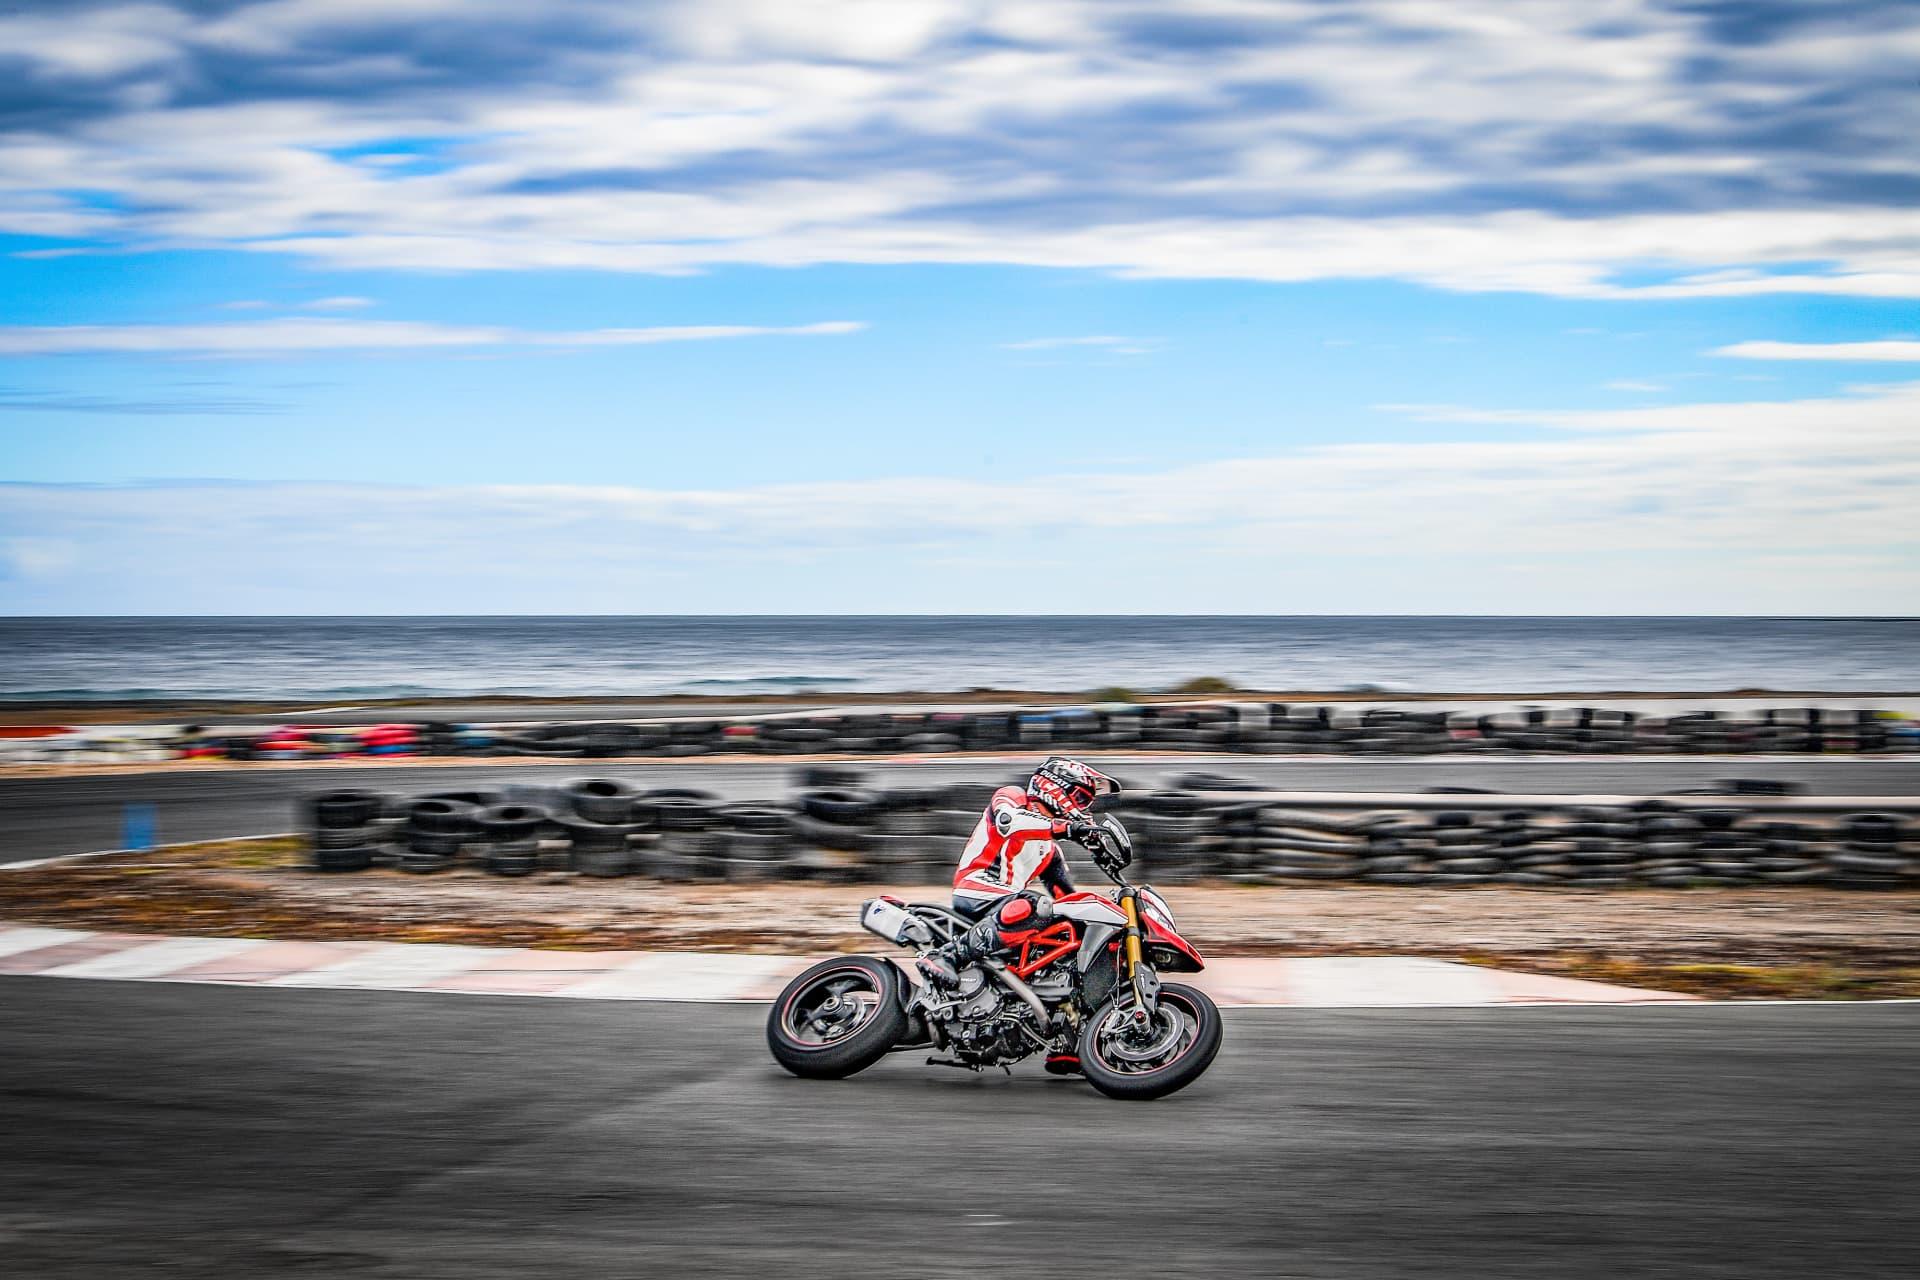 Ducati Hypermotard 950 Sp Performance 06 Uc70338 Mid